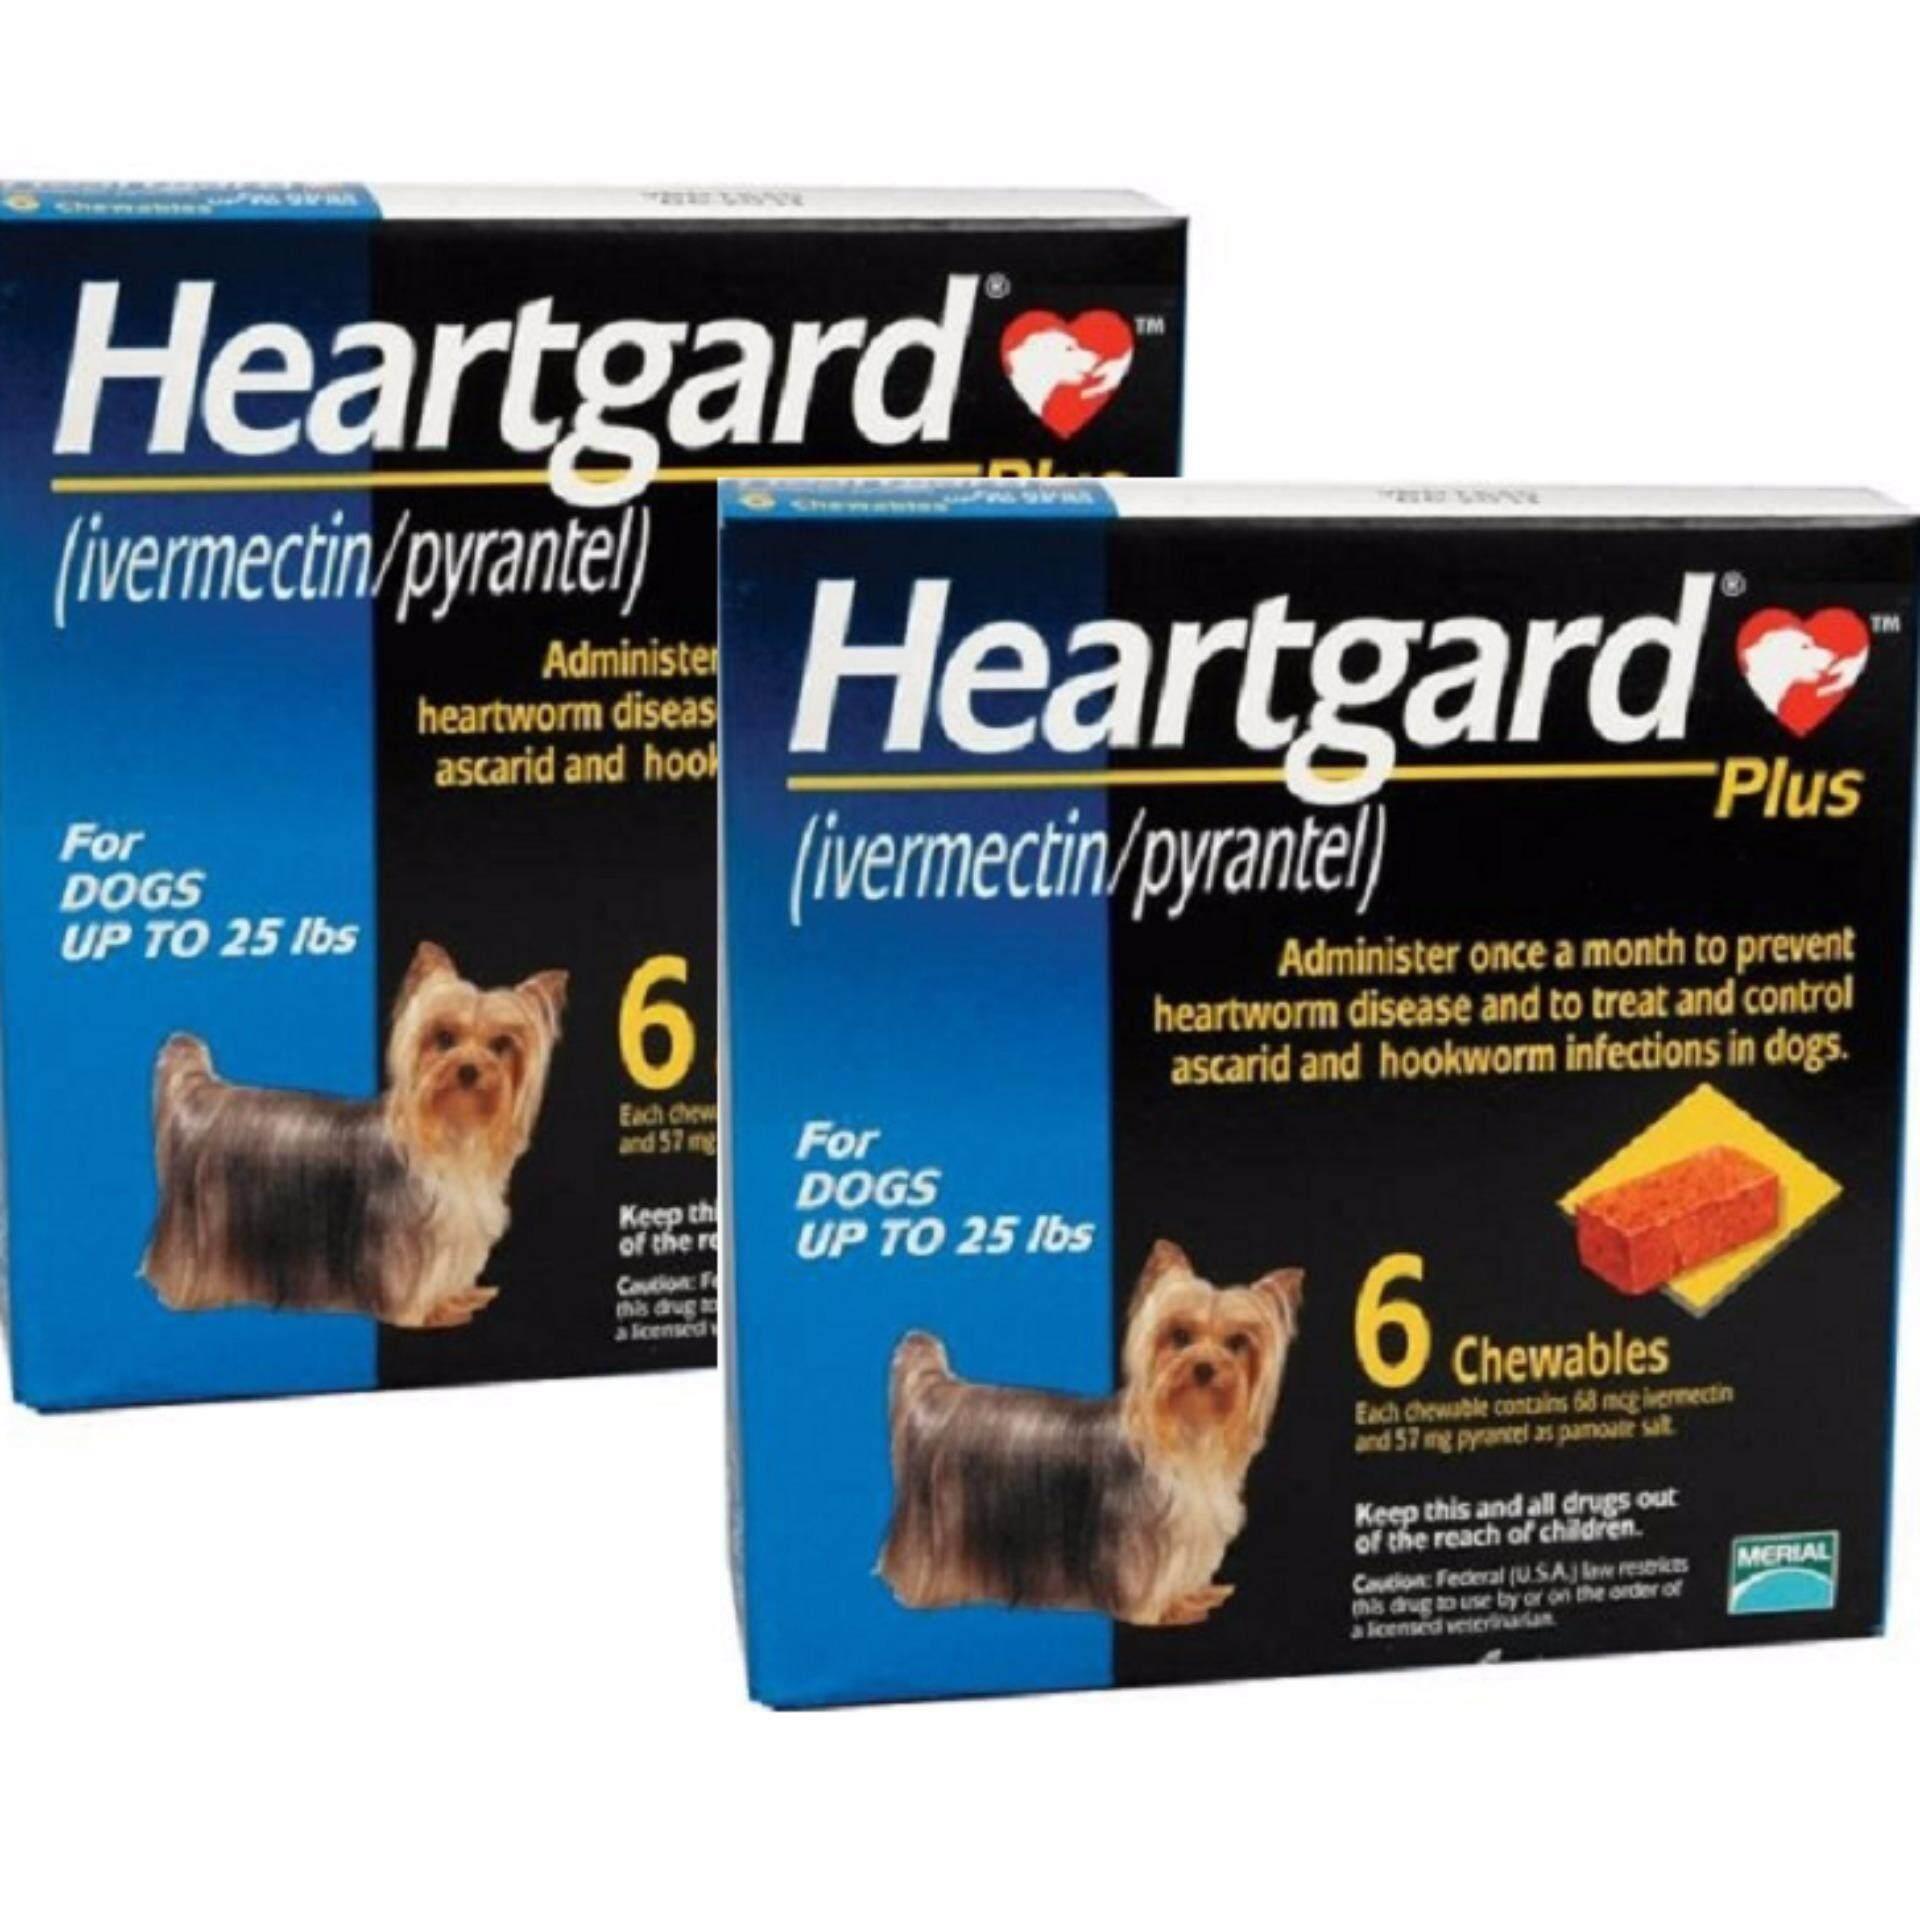 Heartgard Plus สุนัข 1-11 กก. (2 กล่อง) [Exp: 12/2020]  กินป้องกันพยาธิหนอนหัวใจ และถ่ายพยาธิภายใน  + ส่งฟรี KERRY+